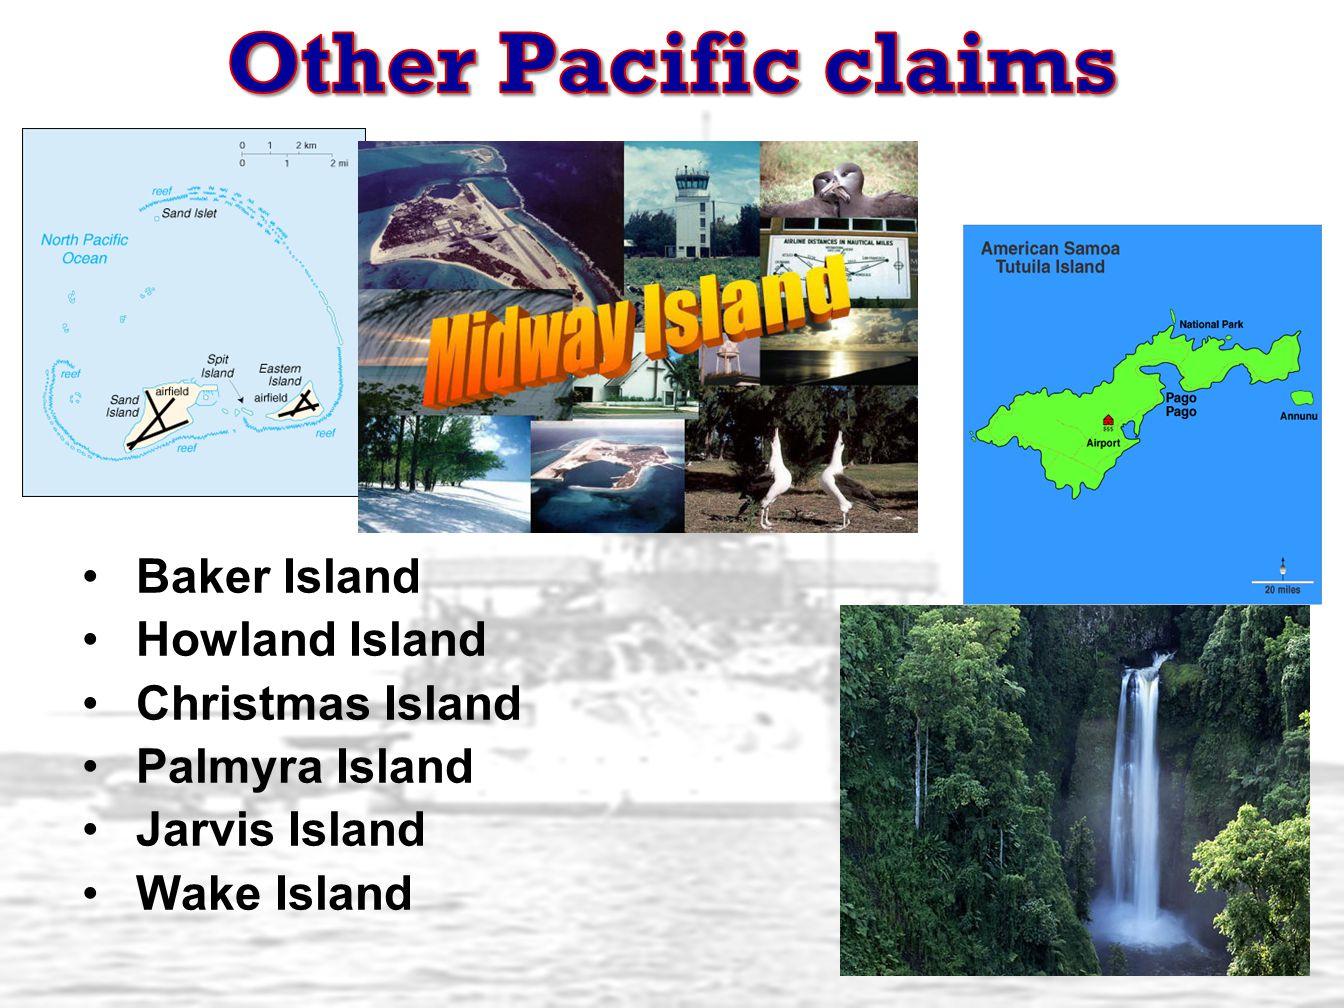 Baker Island Howland Island Christmas Island Palmyra Island Jarvis Island Wake Island